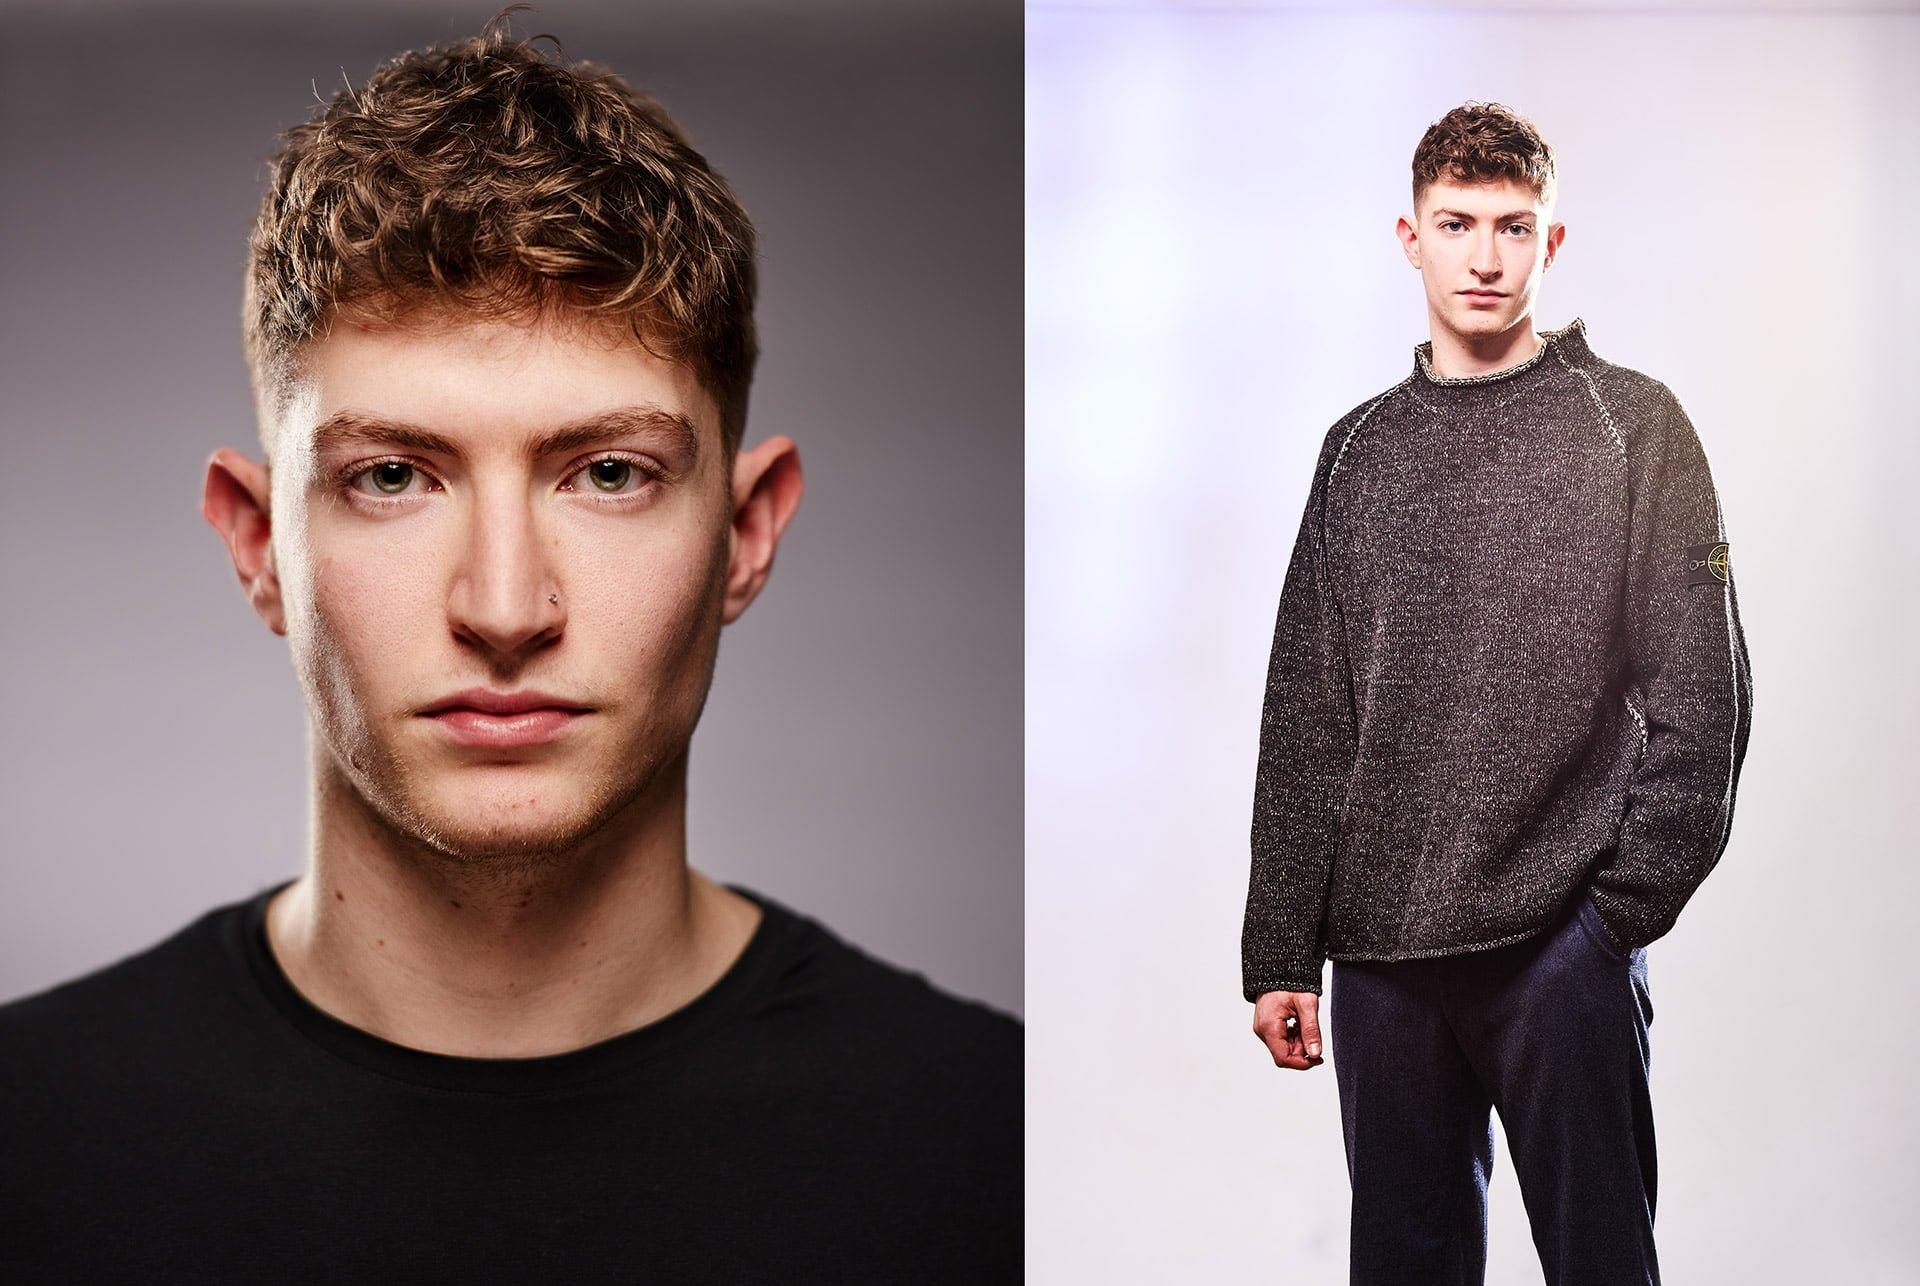 Sam_Goldreich_actor_model_brighton